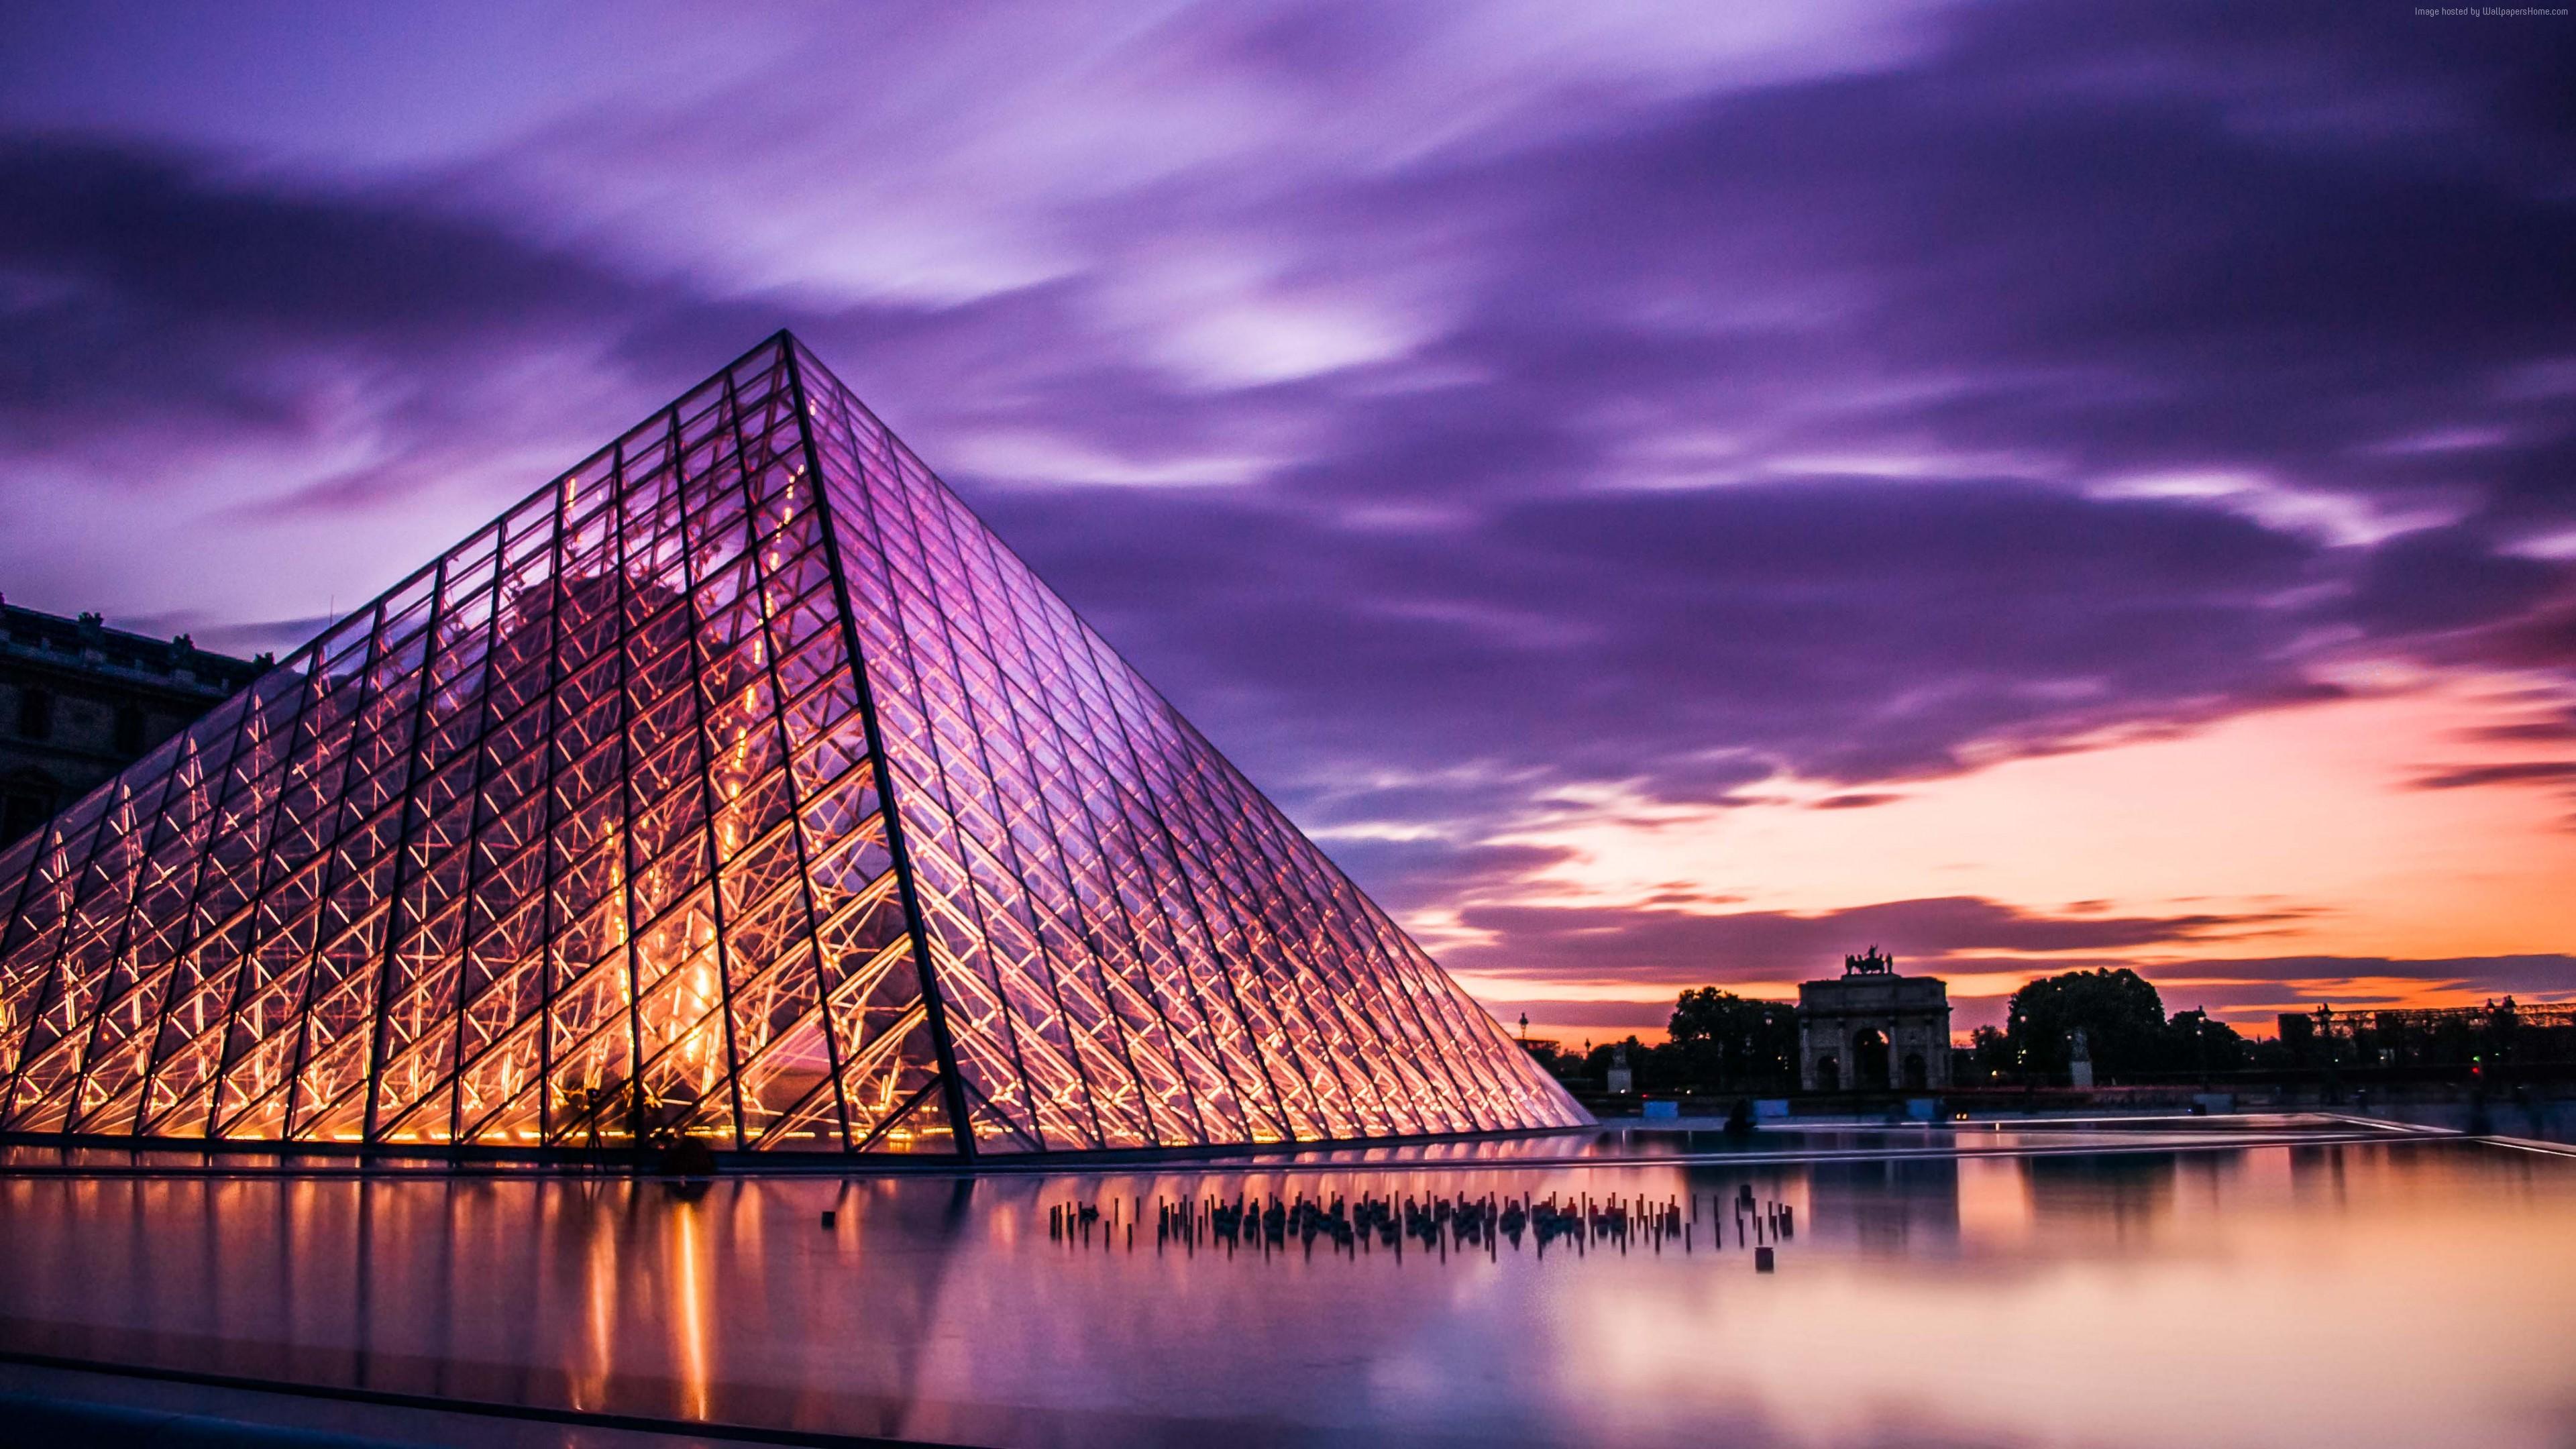 Wallpaper Louvre Paris France Travel Tourism Travel Wallpaper Download High Resolution 4k Wallpaper